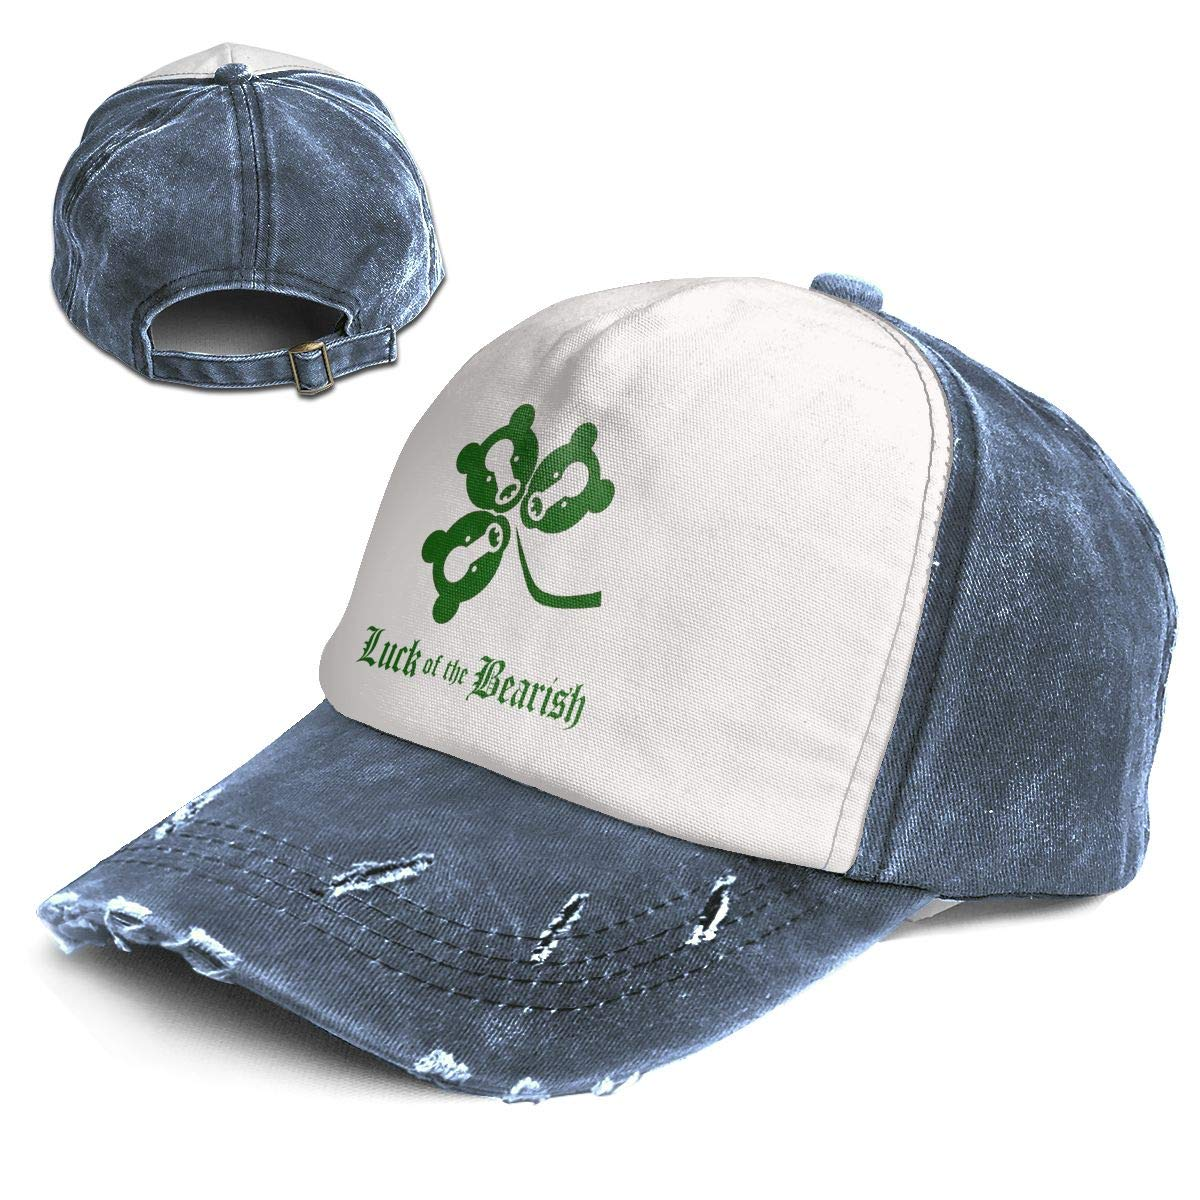 Fashion Vintage Hat Luck of The Bearish Adjustable Dad Hat Baseball Cowboy Cap